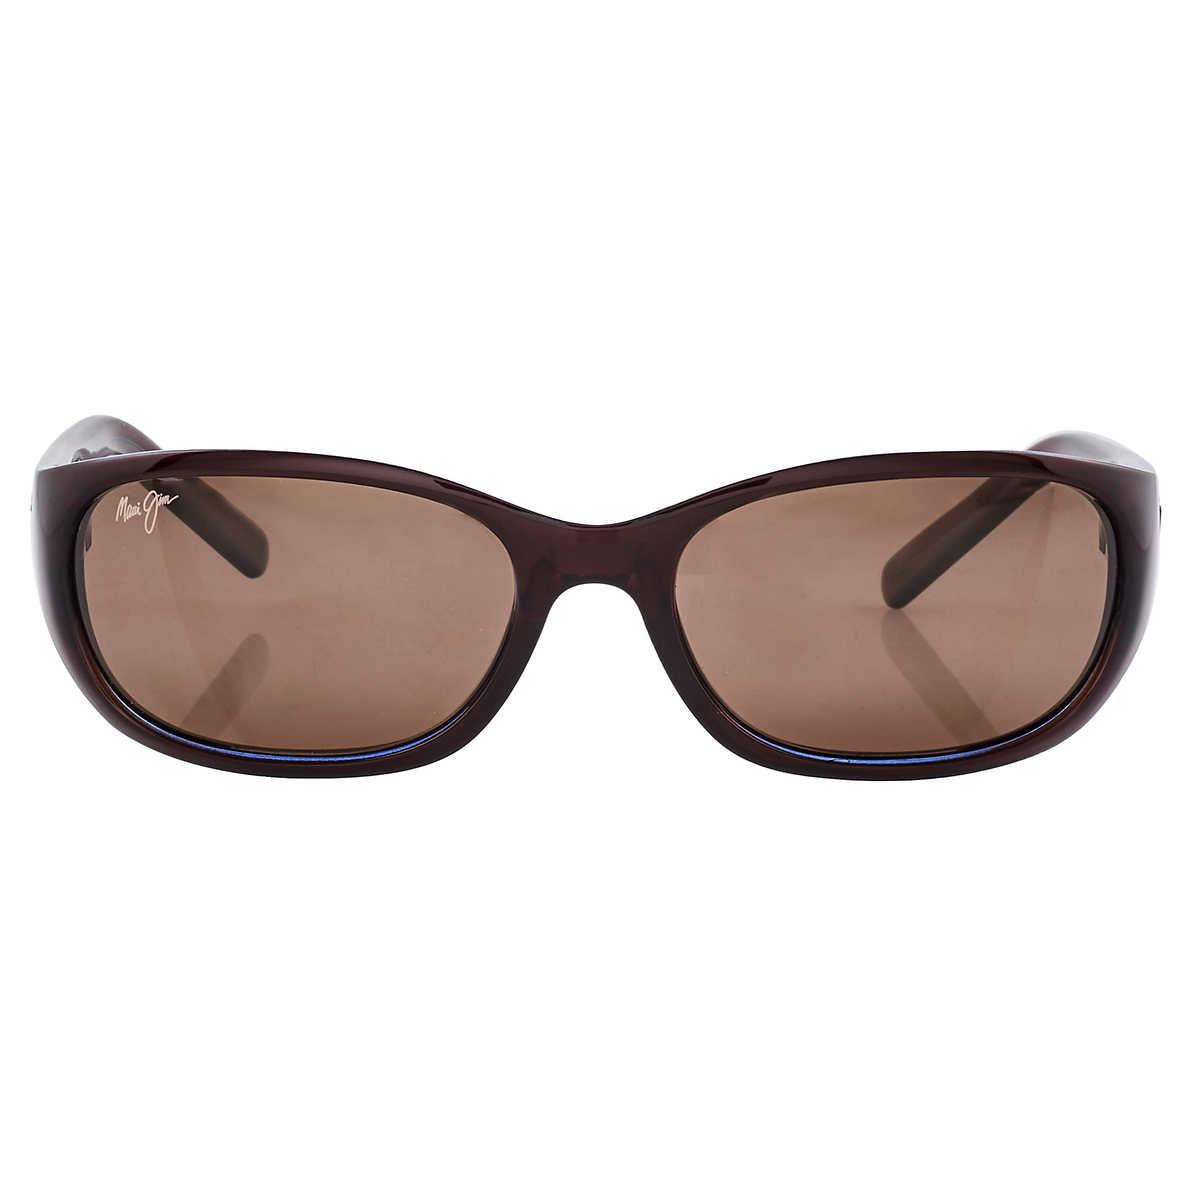 cc7979d92223 ... Maui Jim Kuiaha Bay Brown Sunglasses. 1 1